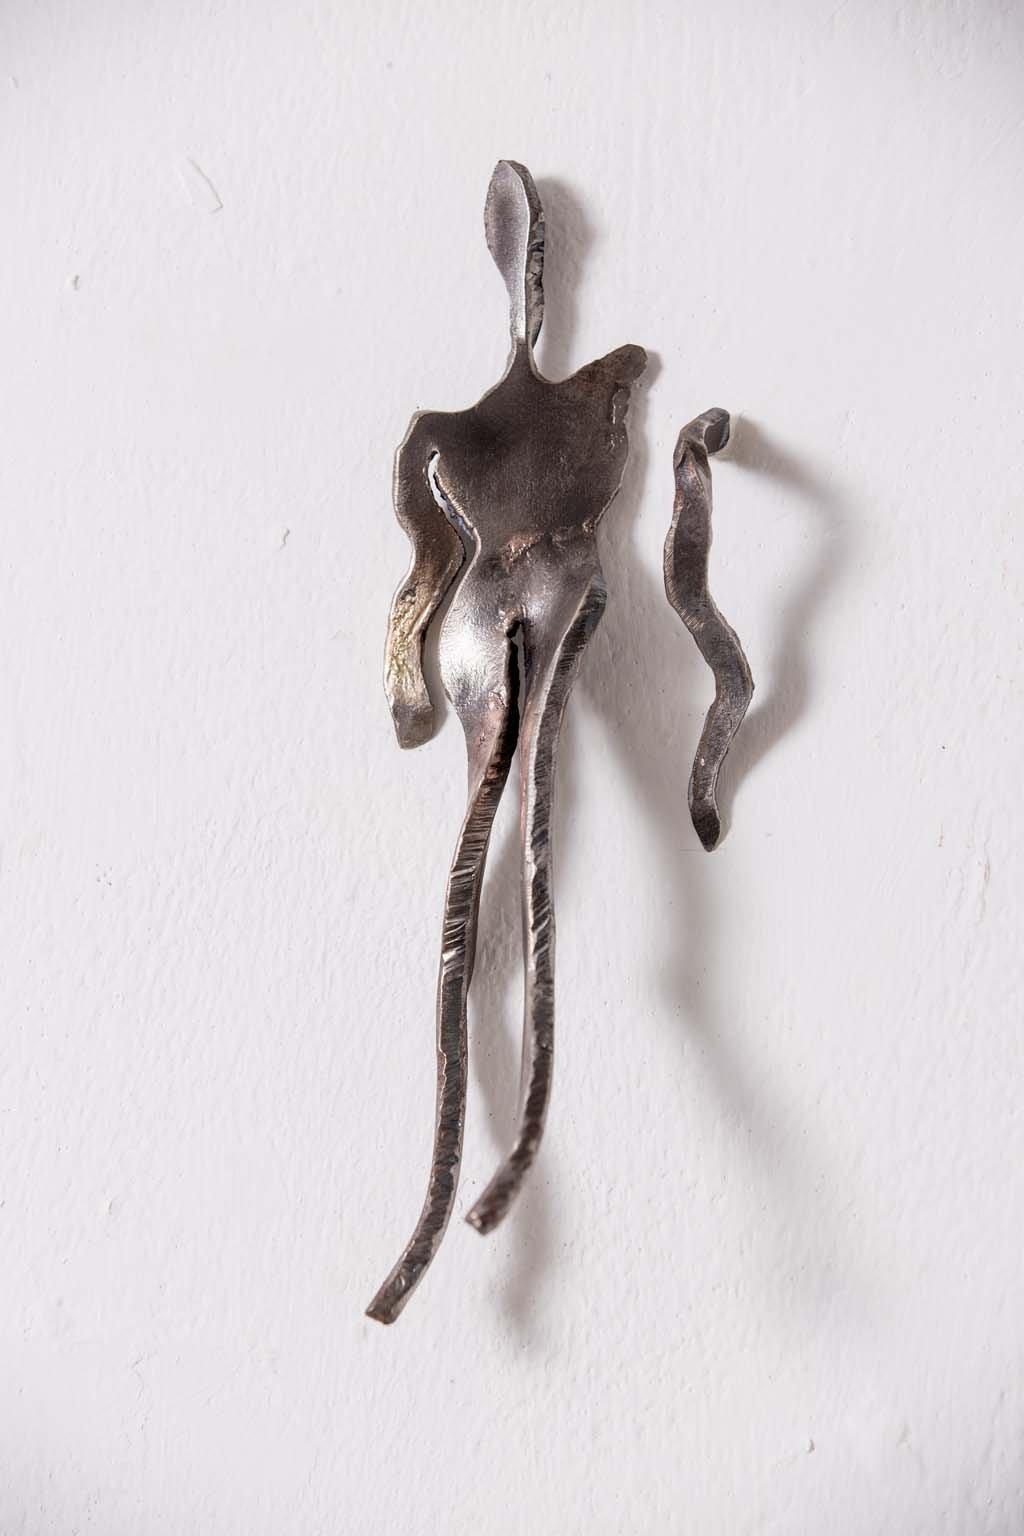 MASA [IV] | 2019 | Iron sculpture of the Israeli artist, sculptor Rami Ater